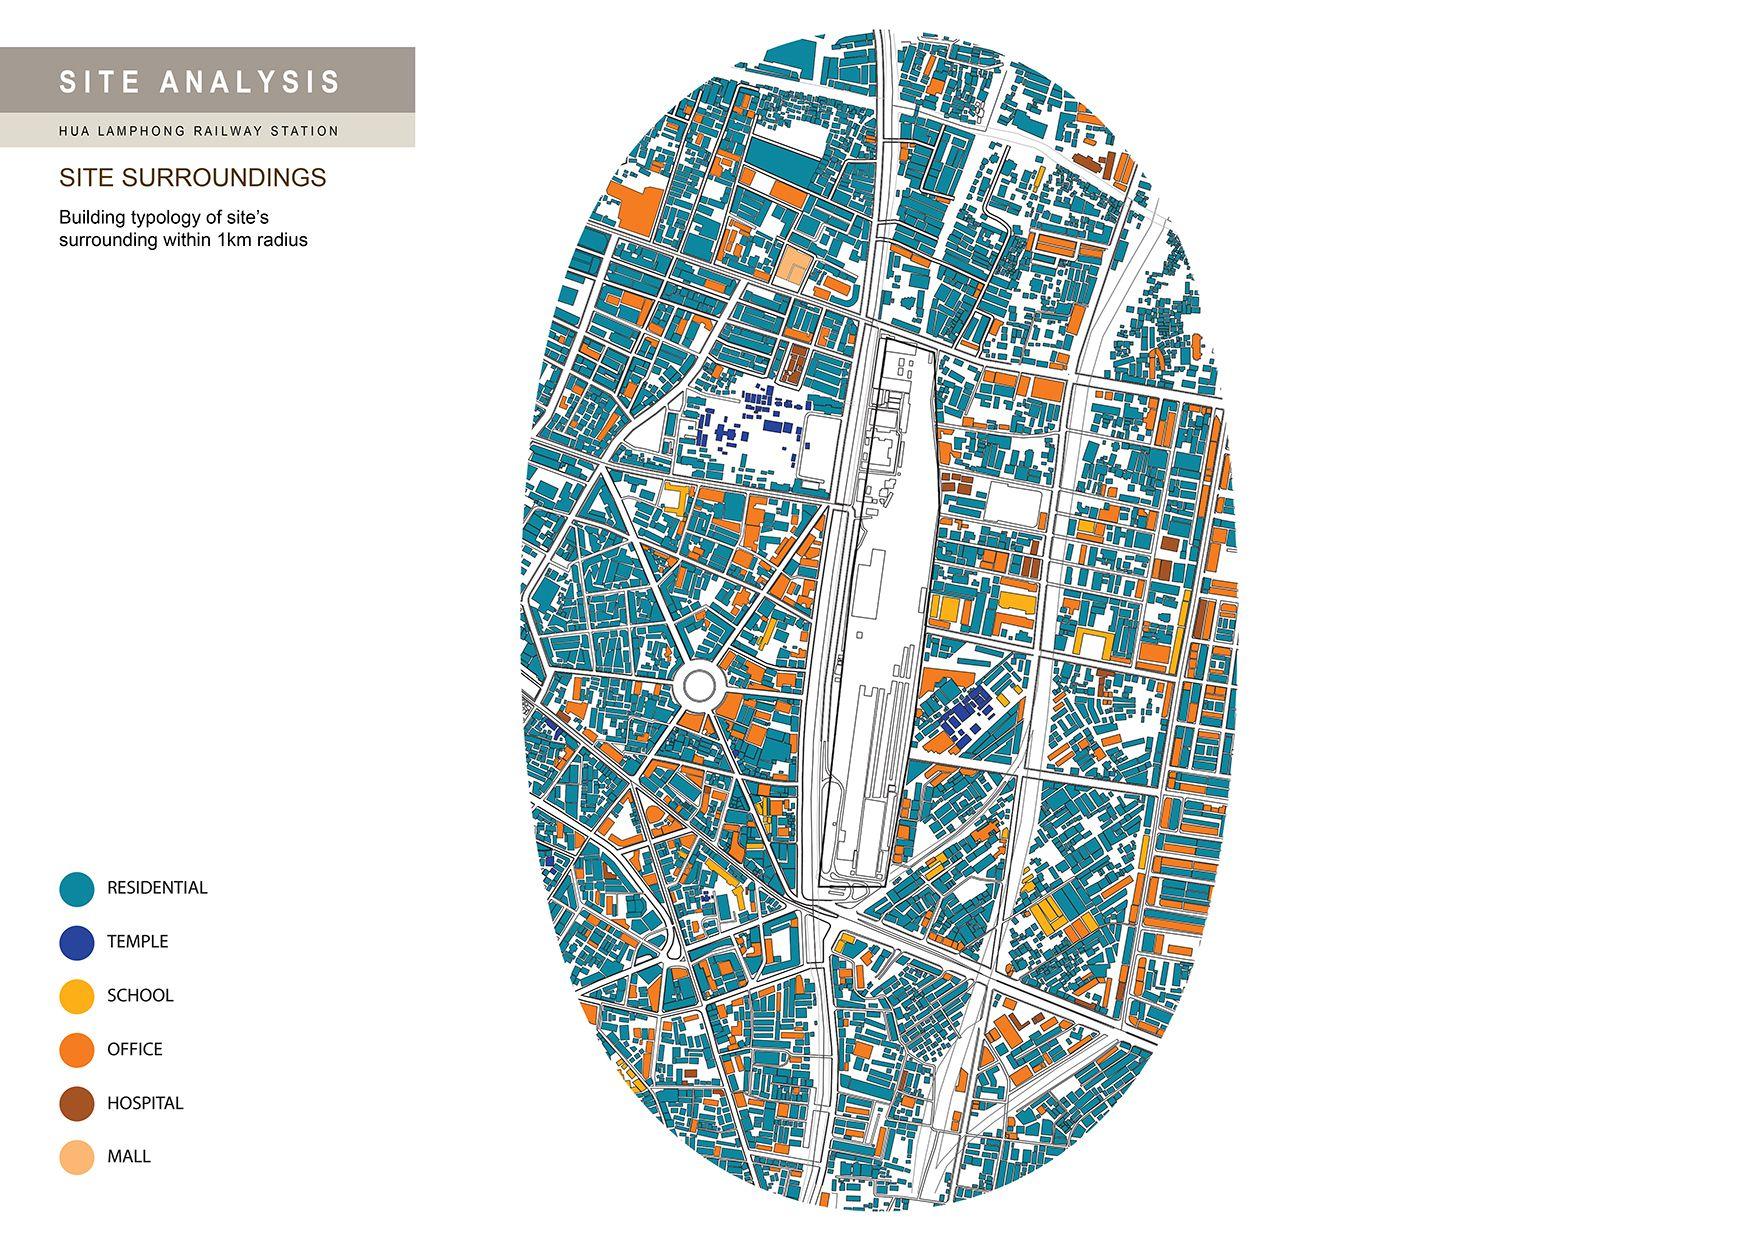 Site Analysis Pin-up //  Bombay Chinnapat Wattanasombat //  Site Context Analysis //  Identifying building usage around the Hua Lamphong site in 1km radius